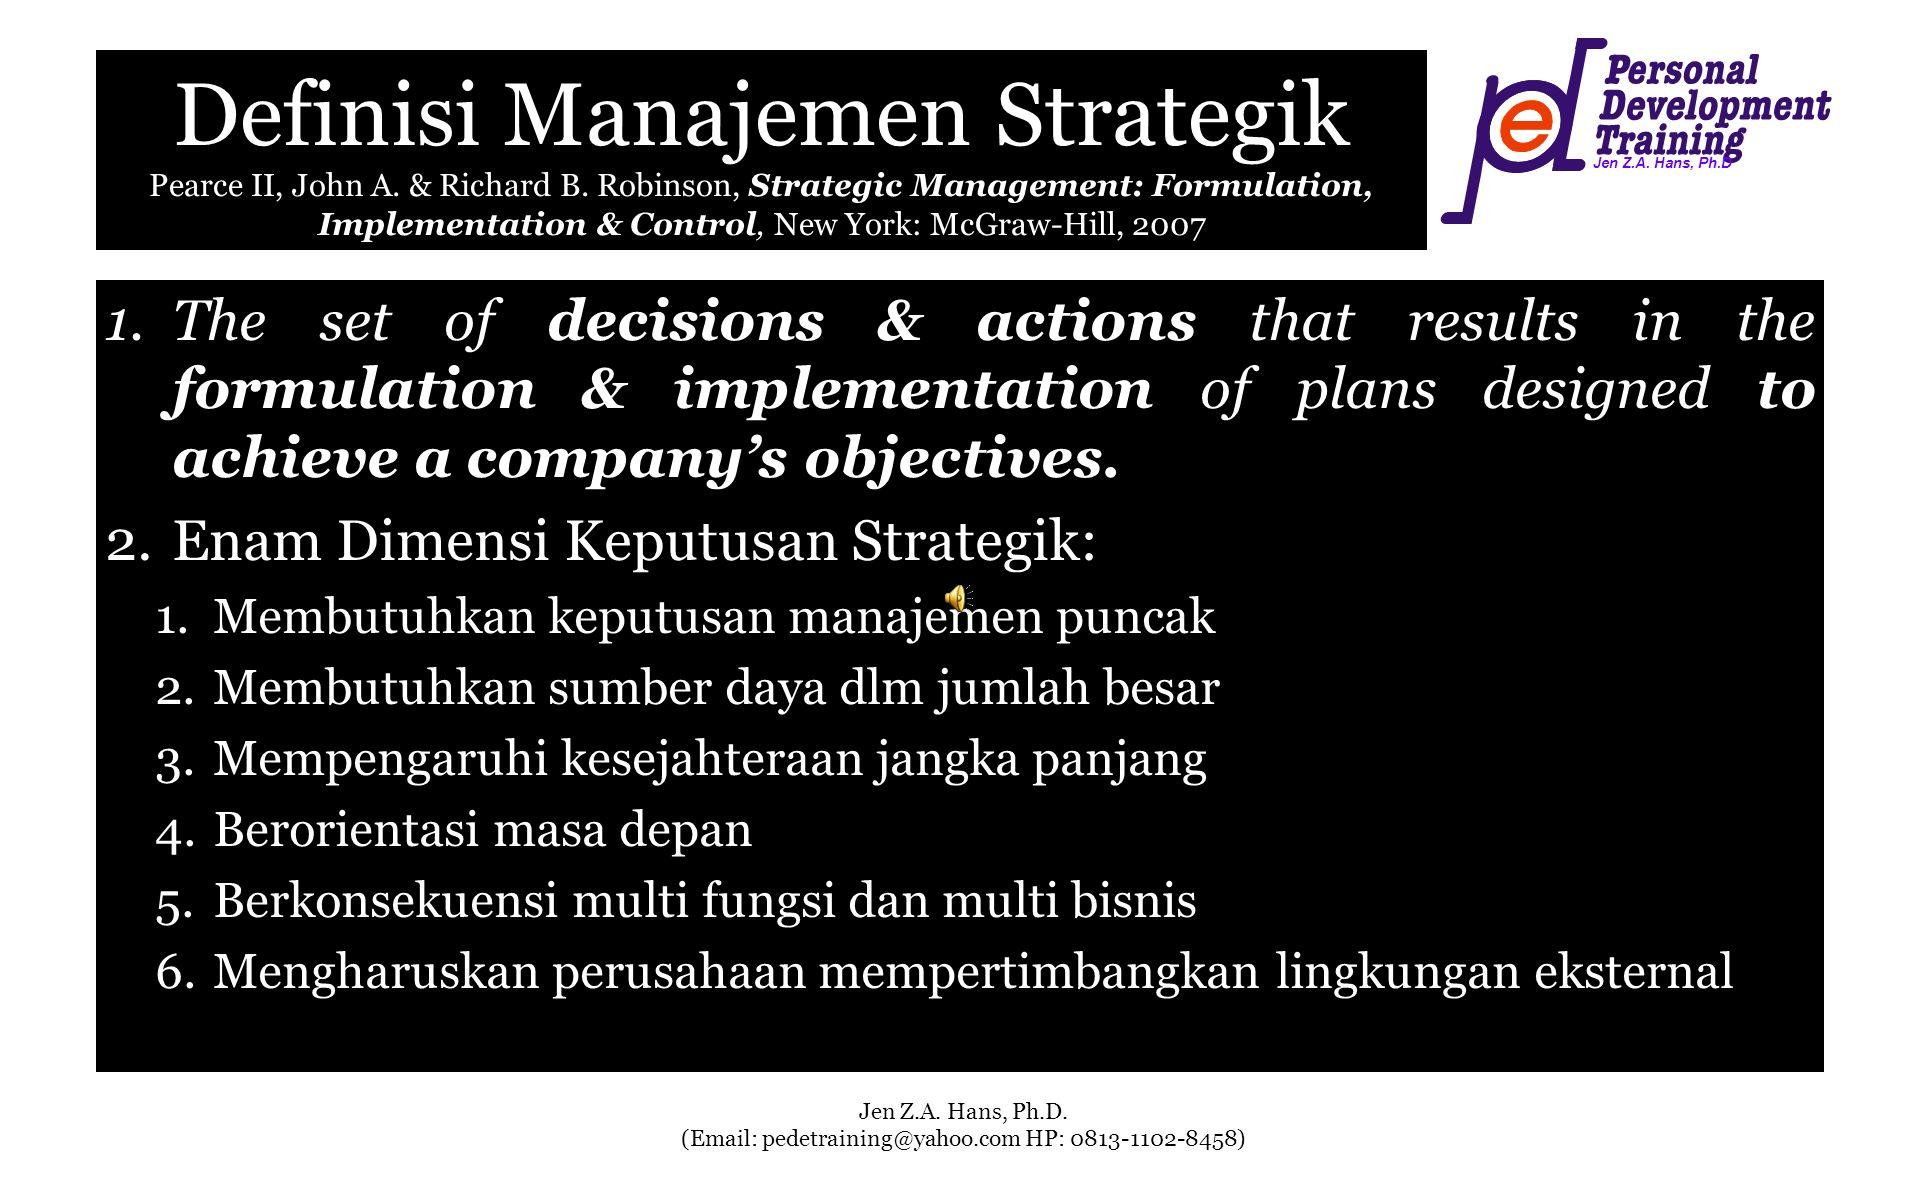 Jen Z.A. Hans, Ph.D Jen Z.A. Hans, Ph.D. (Email: pedetraining@yahoo.com HP: 0813-1102-8458) Definisi Manajemen Strategik Pearce II, John A. & Richard